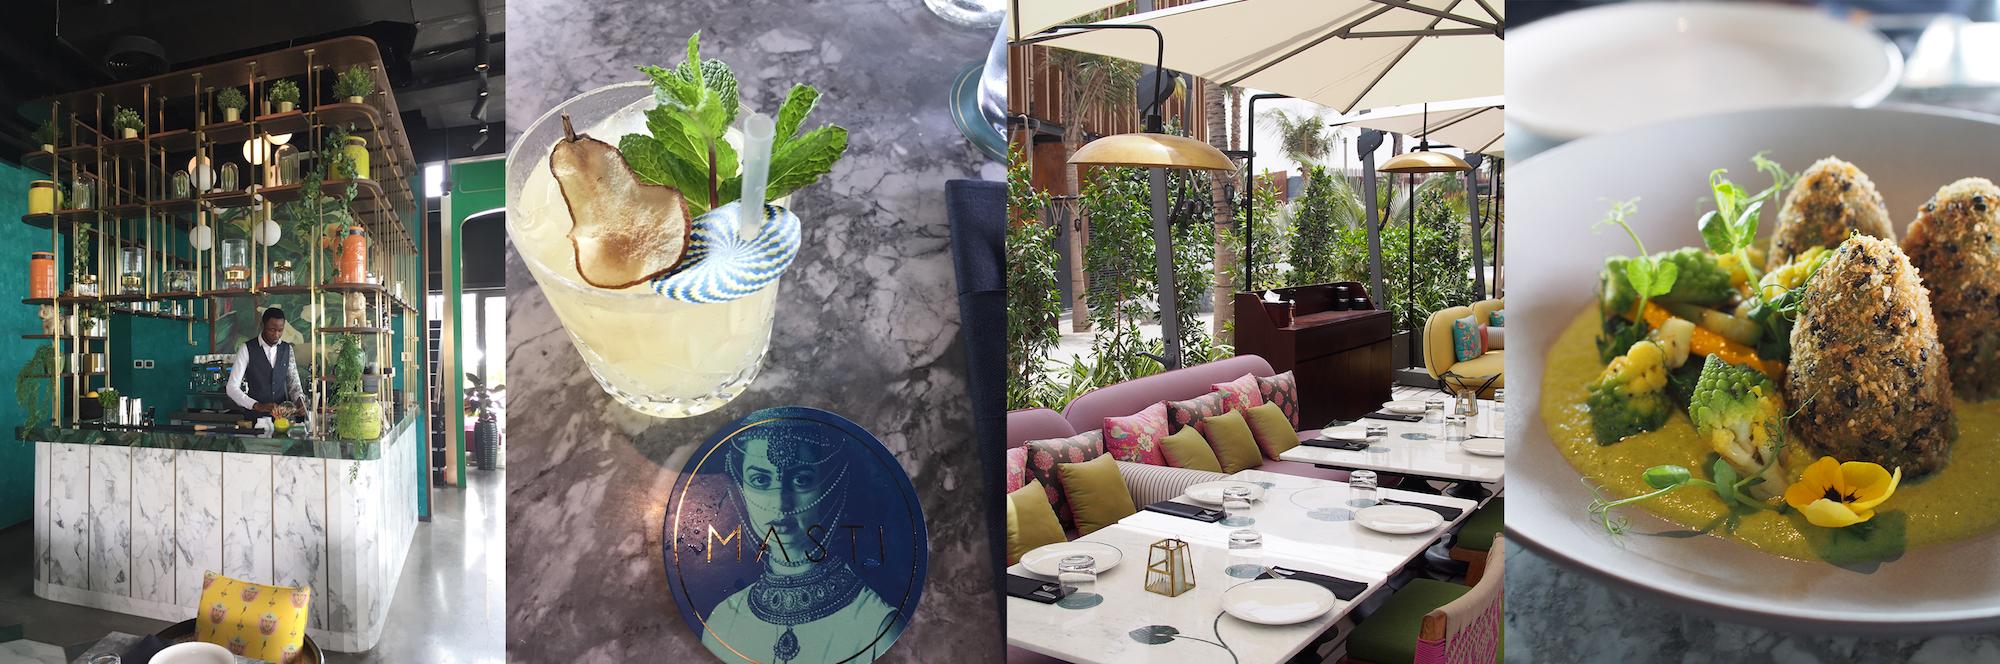 Dubai-Masti-Restaurant